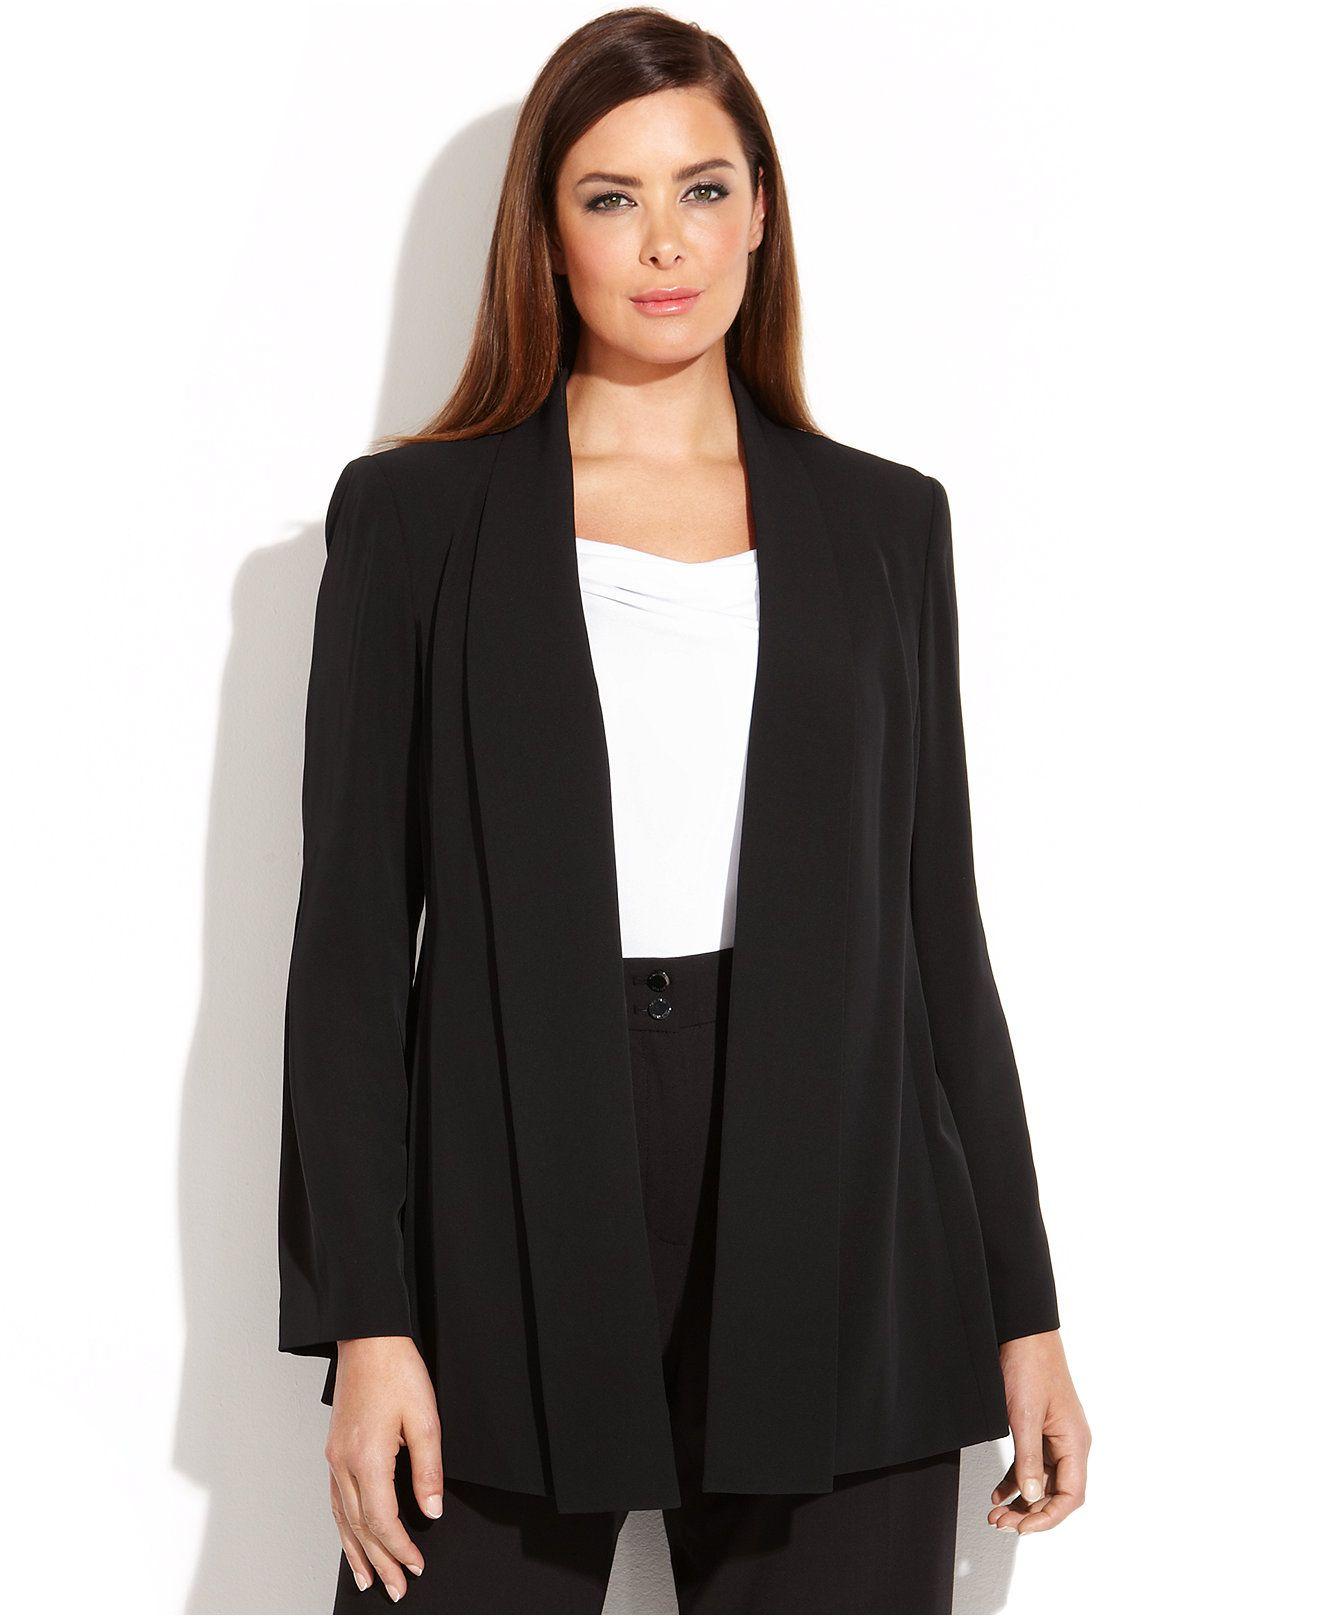 workwear // Calvin Klein Plus Size Open-Front Soft Jacket - Plus Size Sale & Clearance - Plus Sizes - Macy's